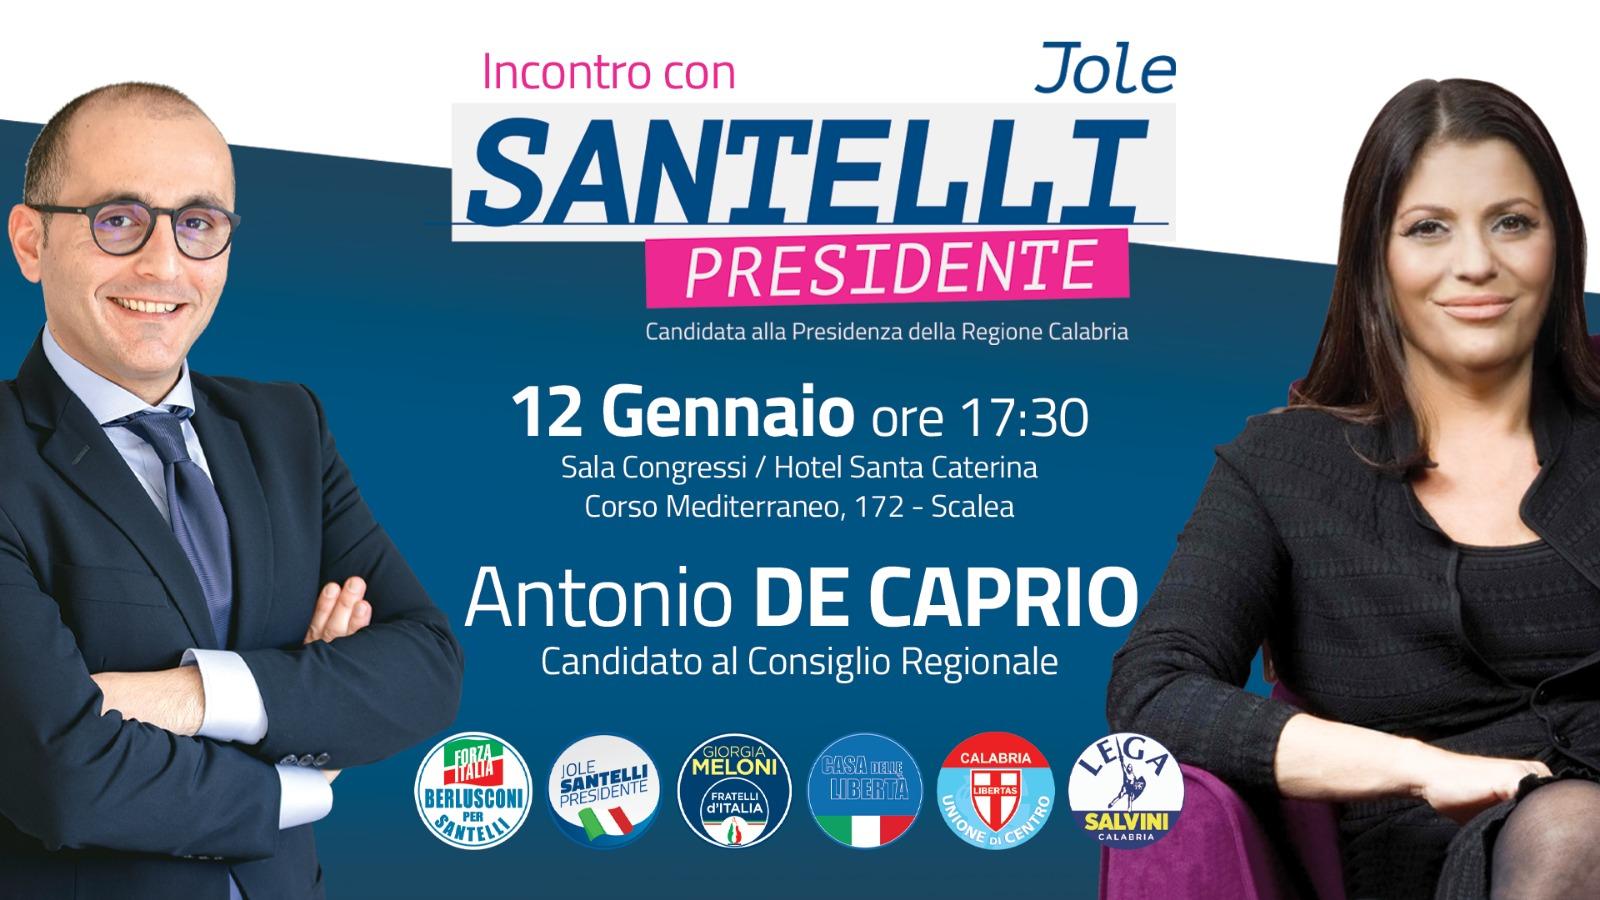 De Caprio - Santelli